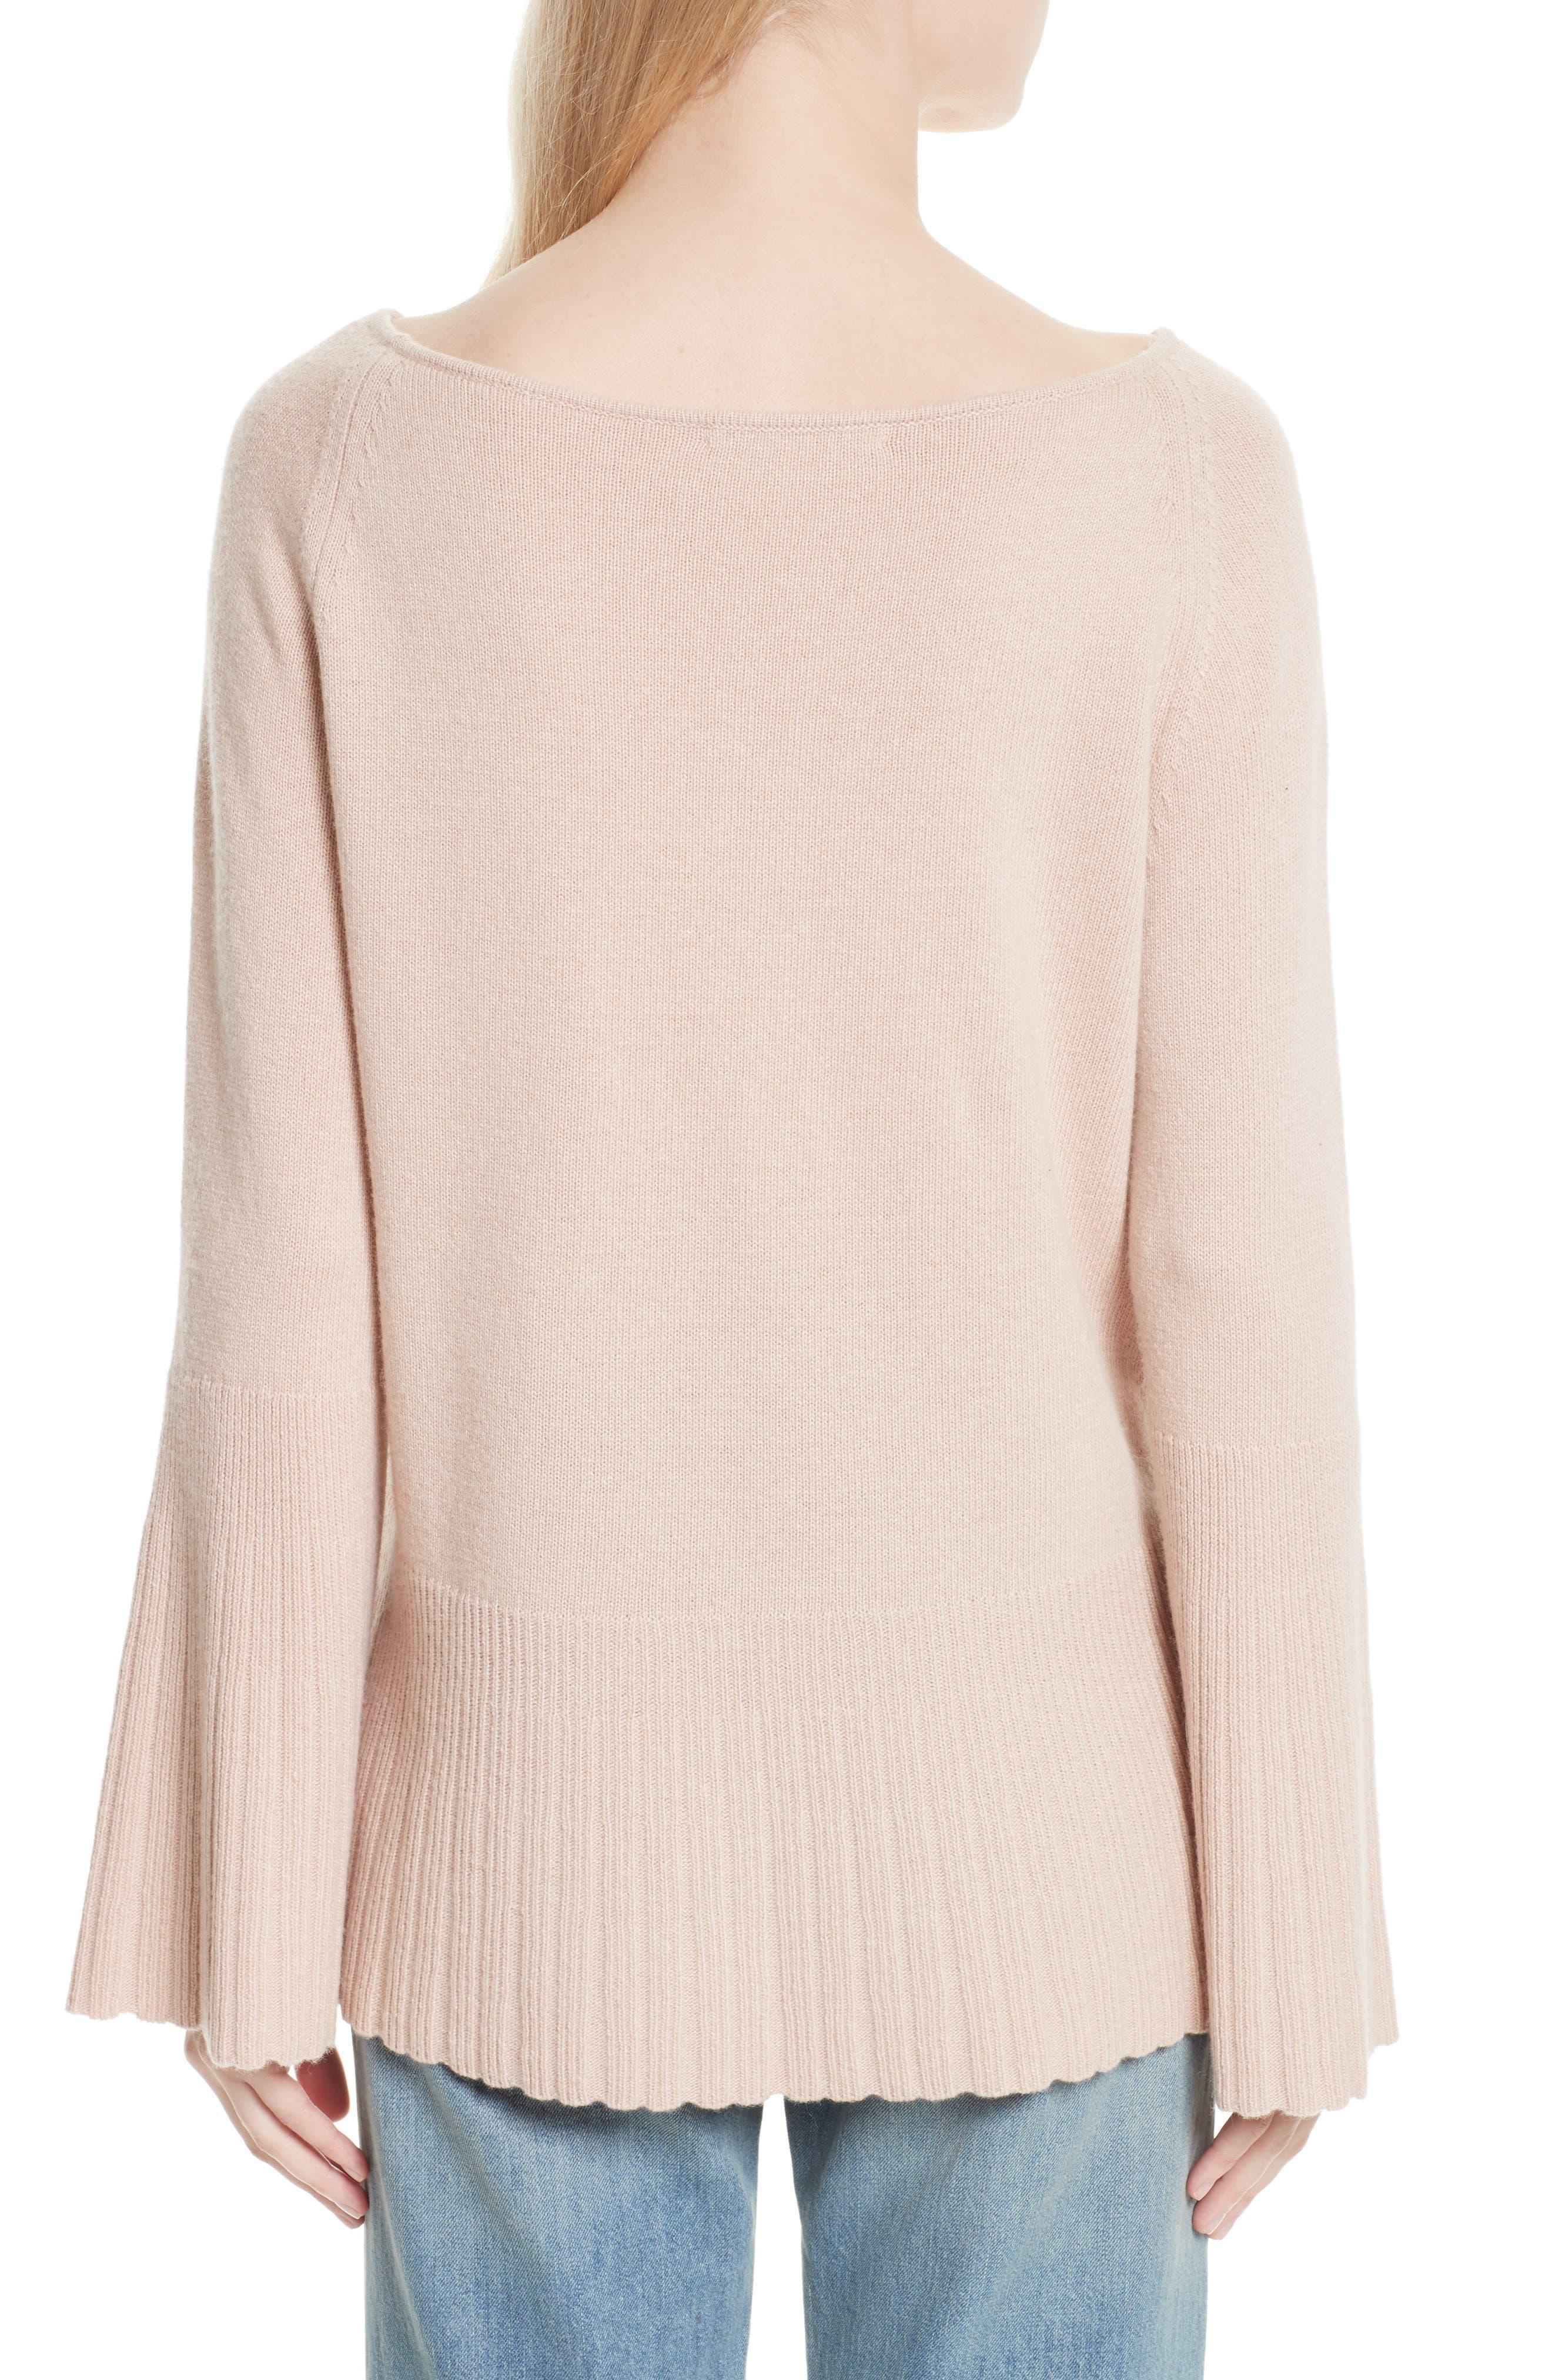 Clarette Bell Sleeve Sweater,                             Alternate thumbnail 2, color,                             650